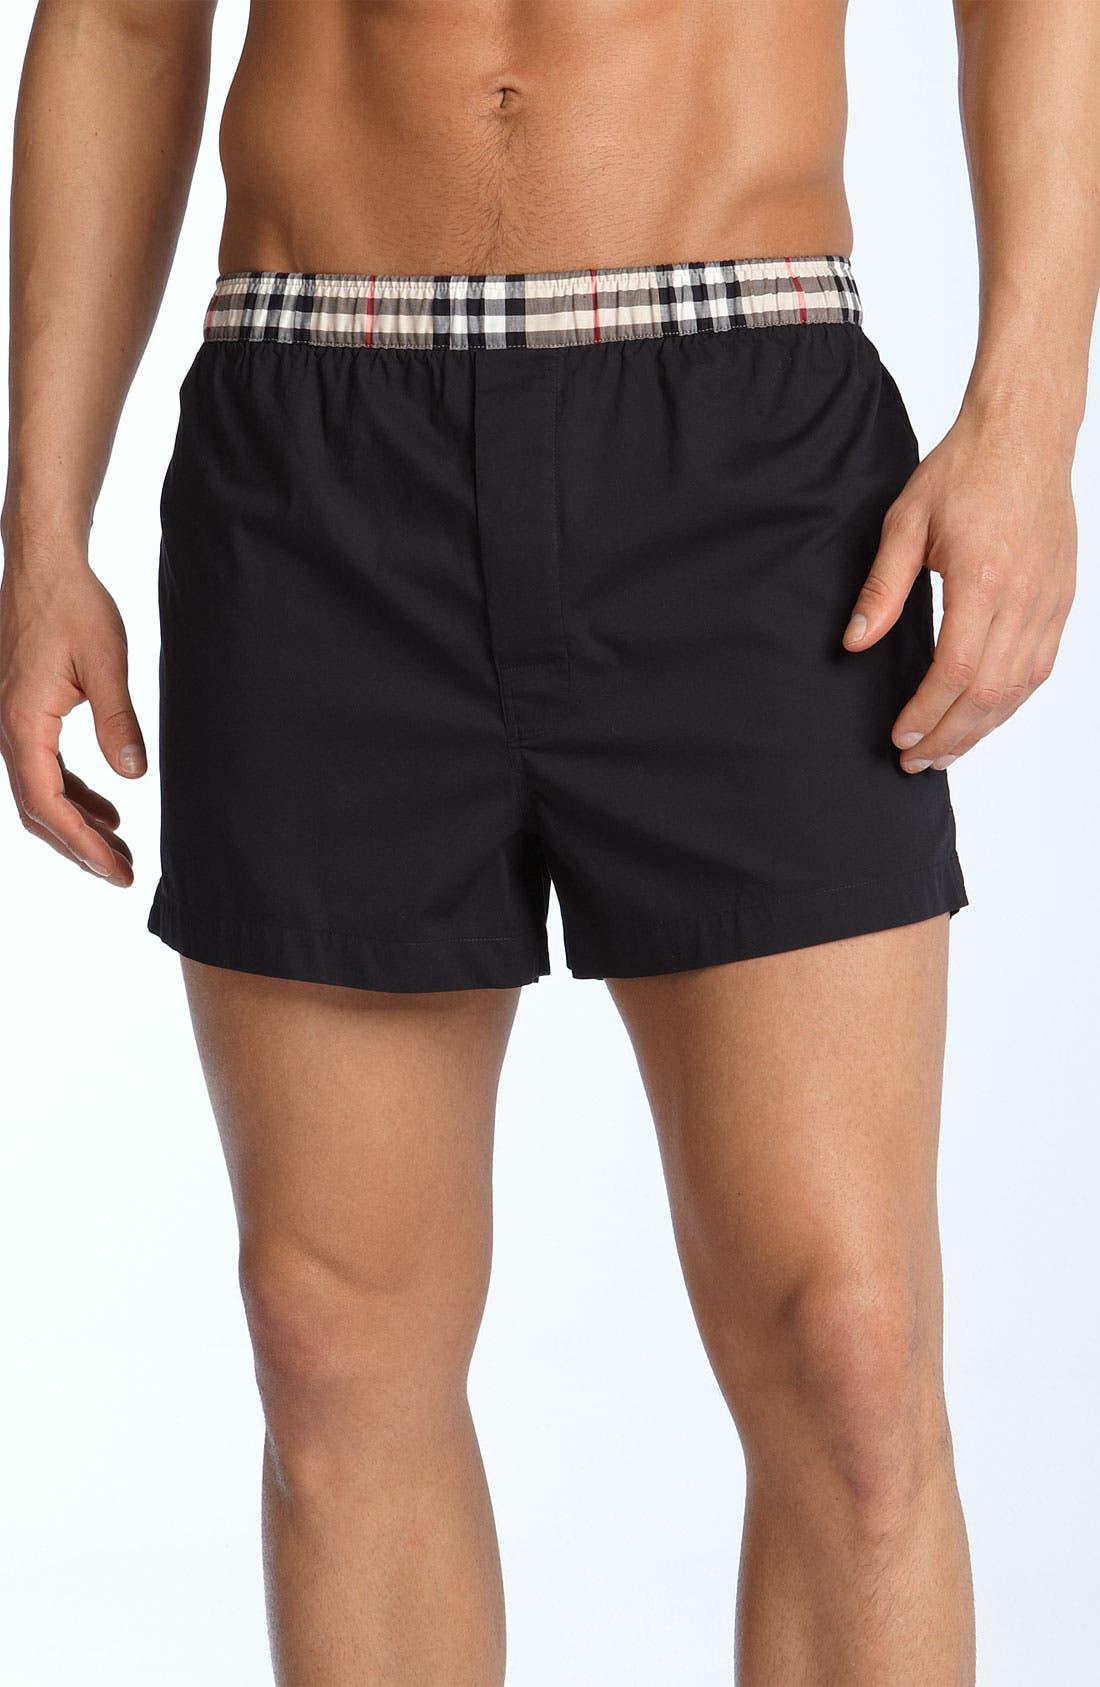 Main Image - Burberry Check Print Woven Boxer Shorts